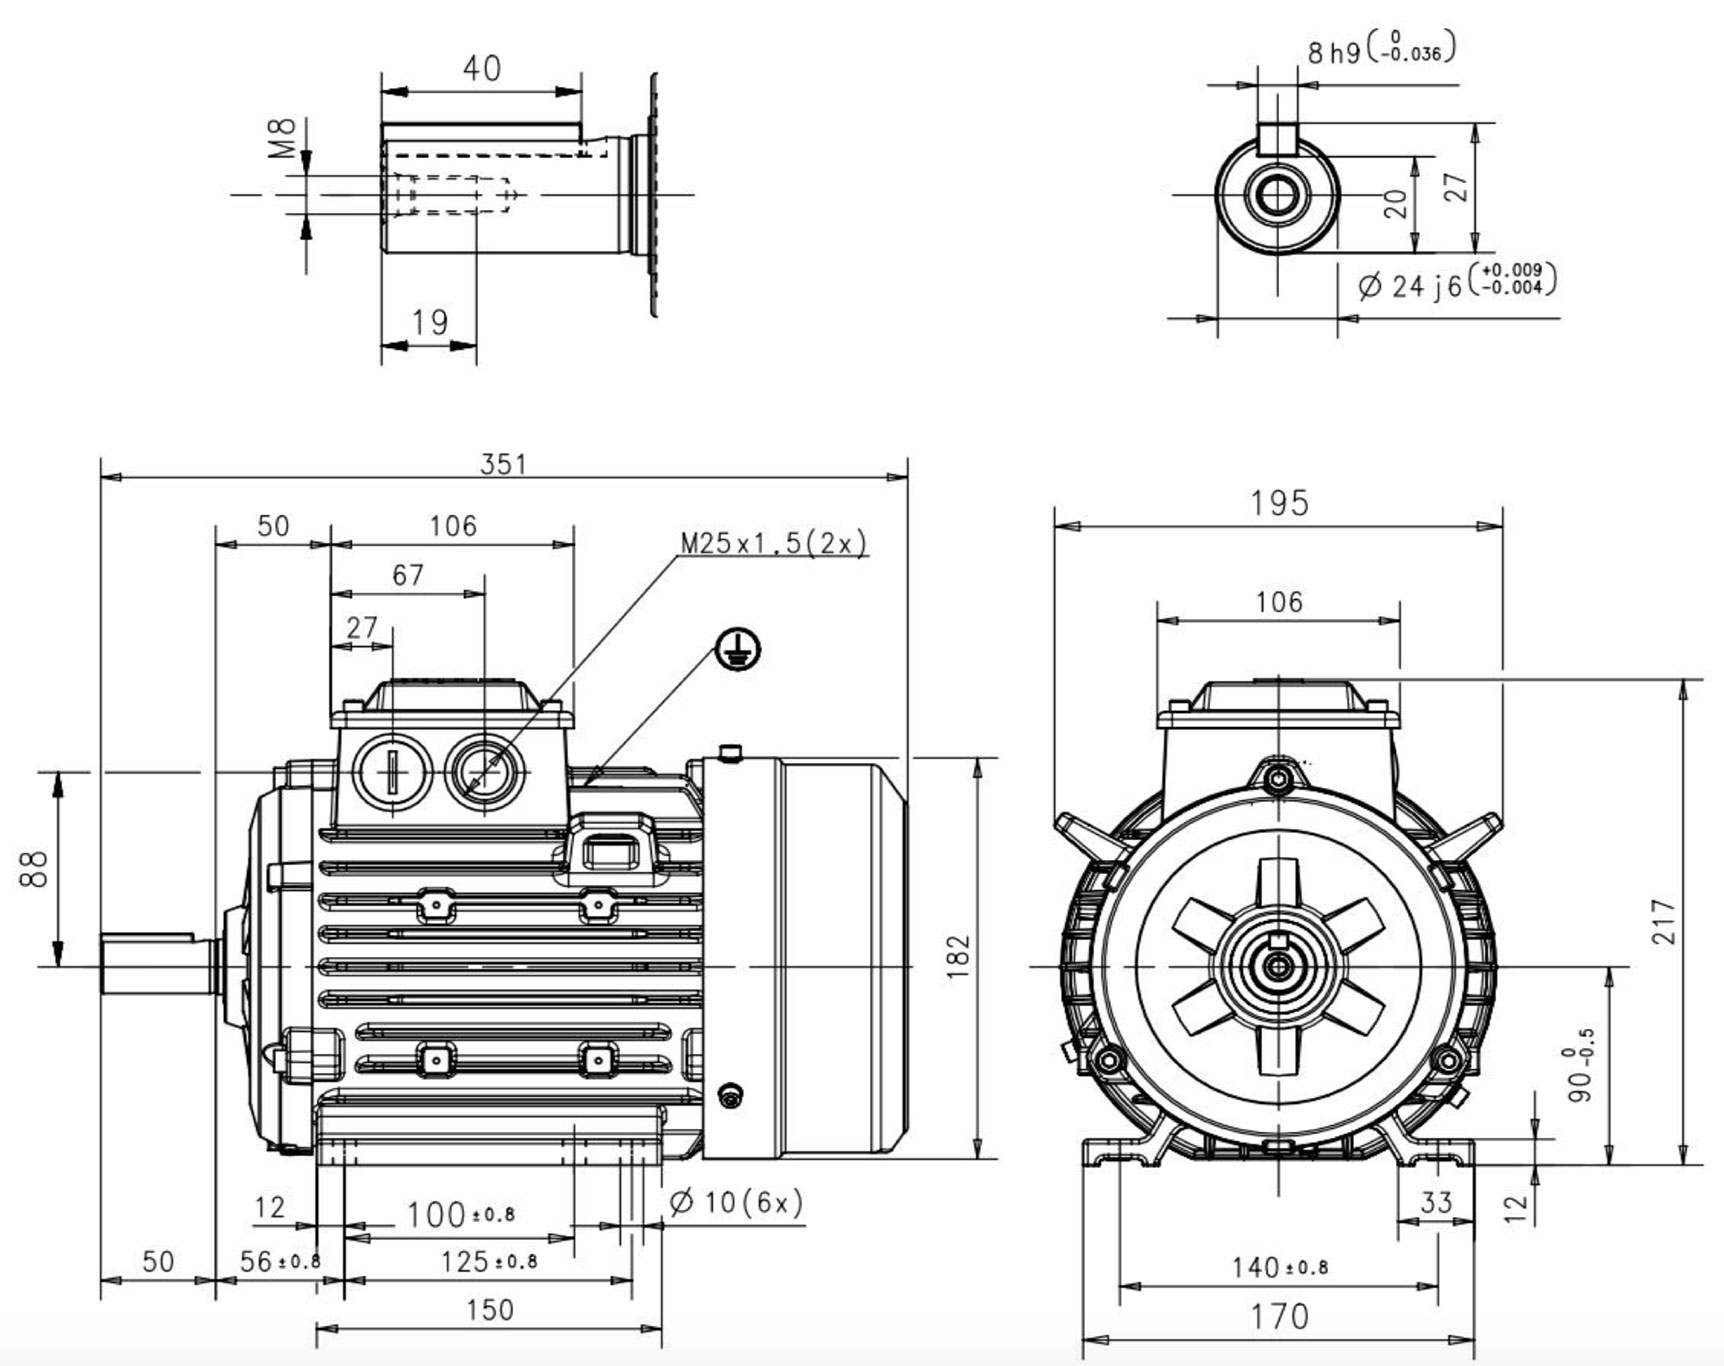 moteur triphas u00e9 1 5 kw  1500 tr  min  b3  400  690v